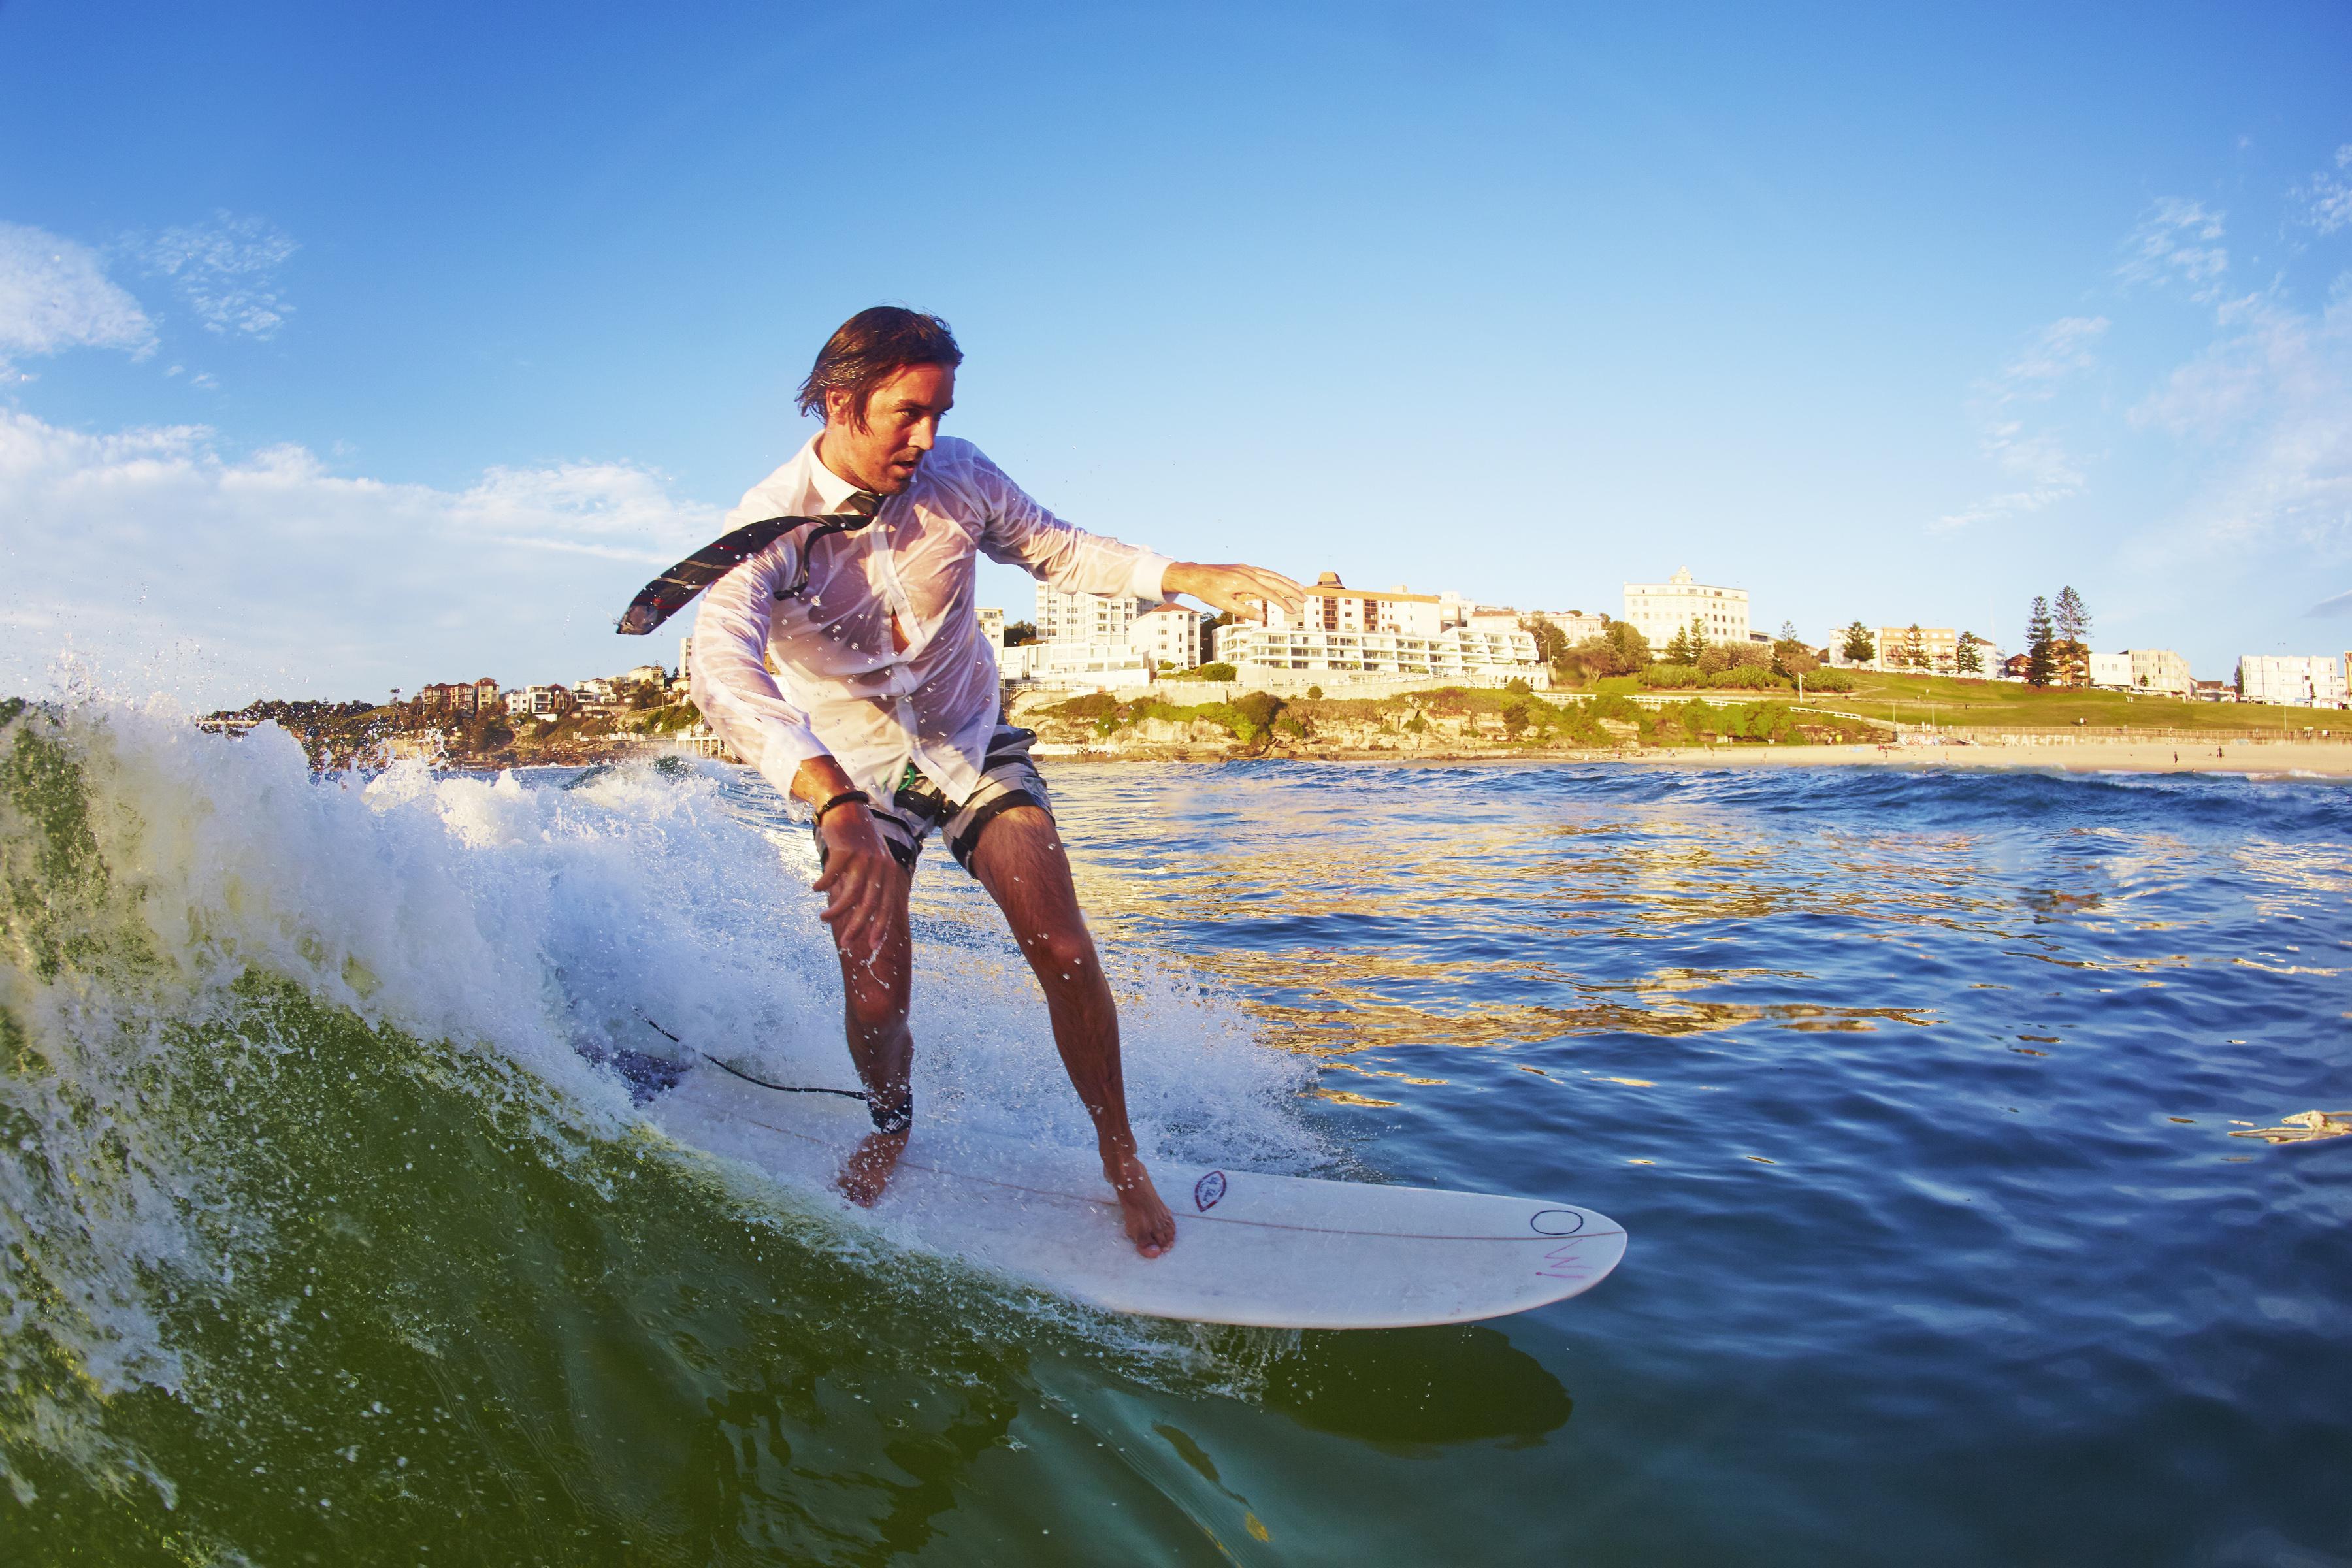 Grant Trebilco surfing at OneWave's first 'Fluro